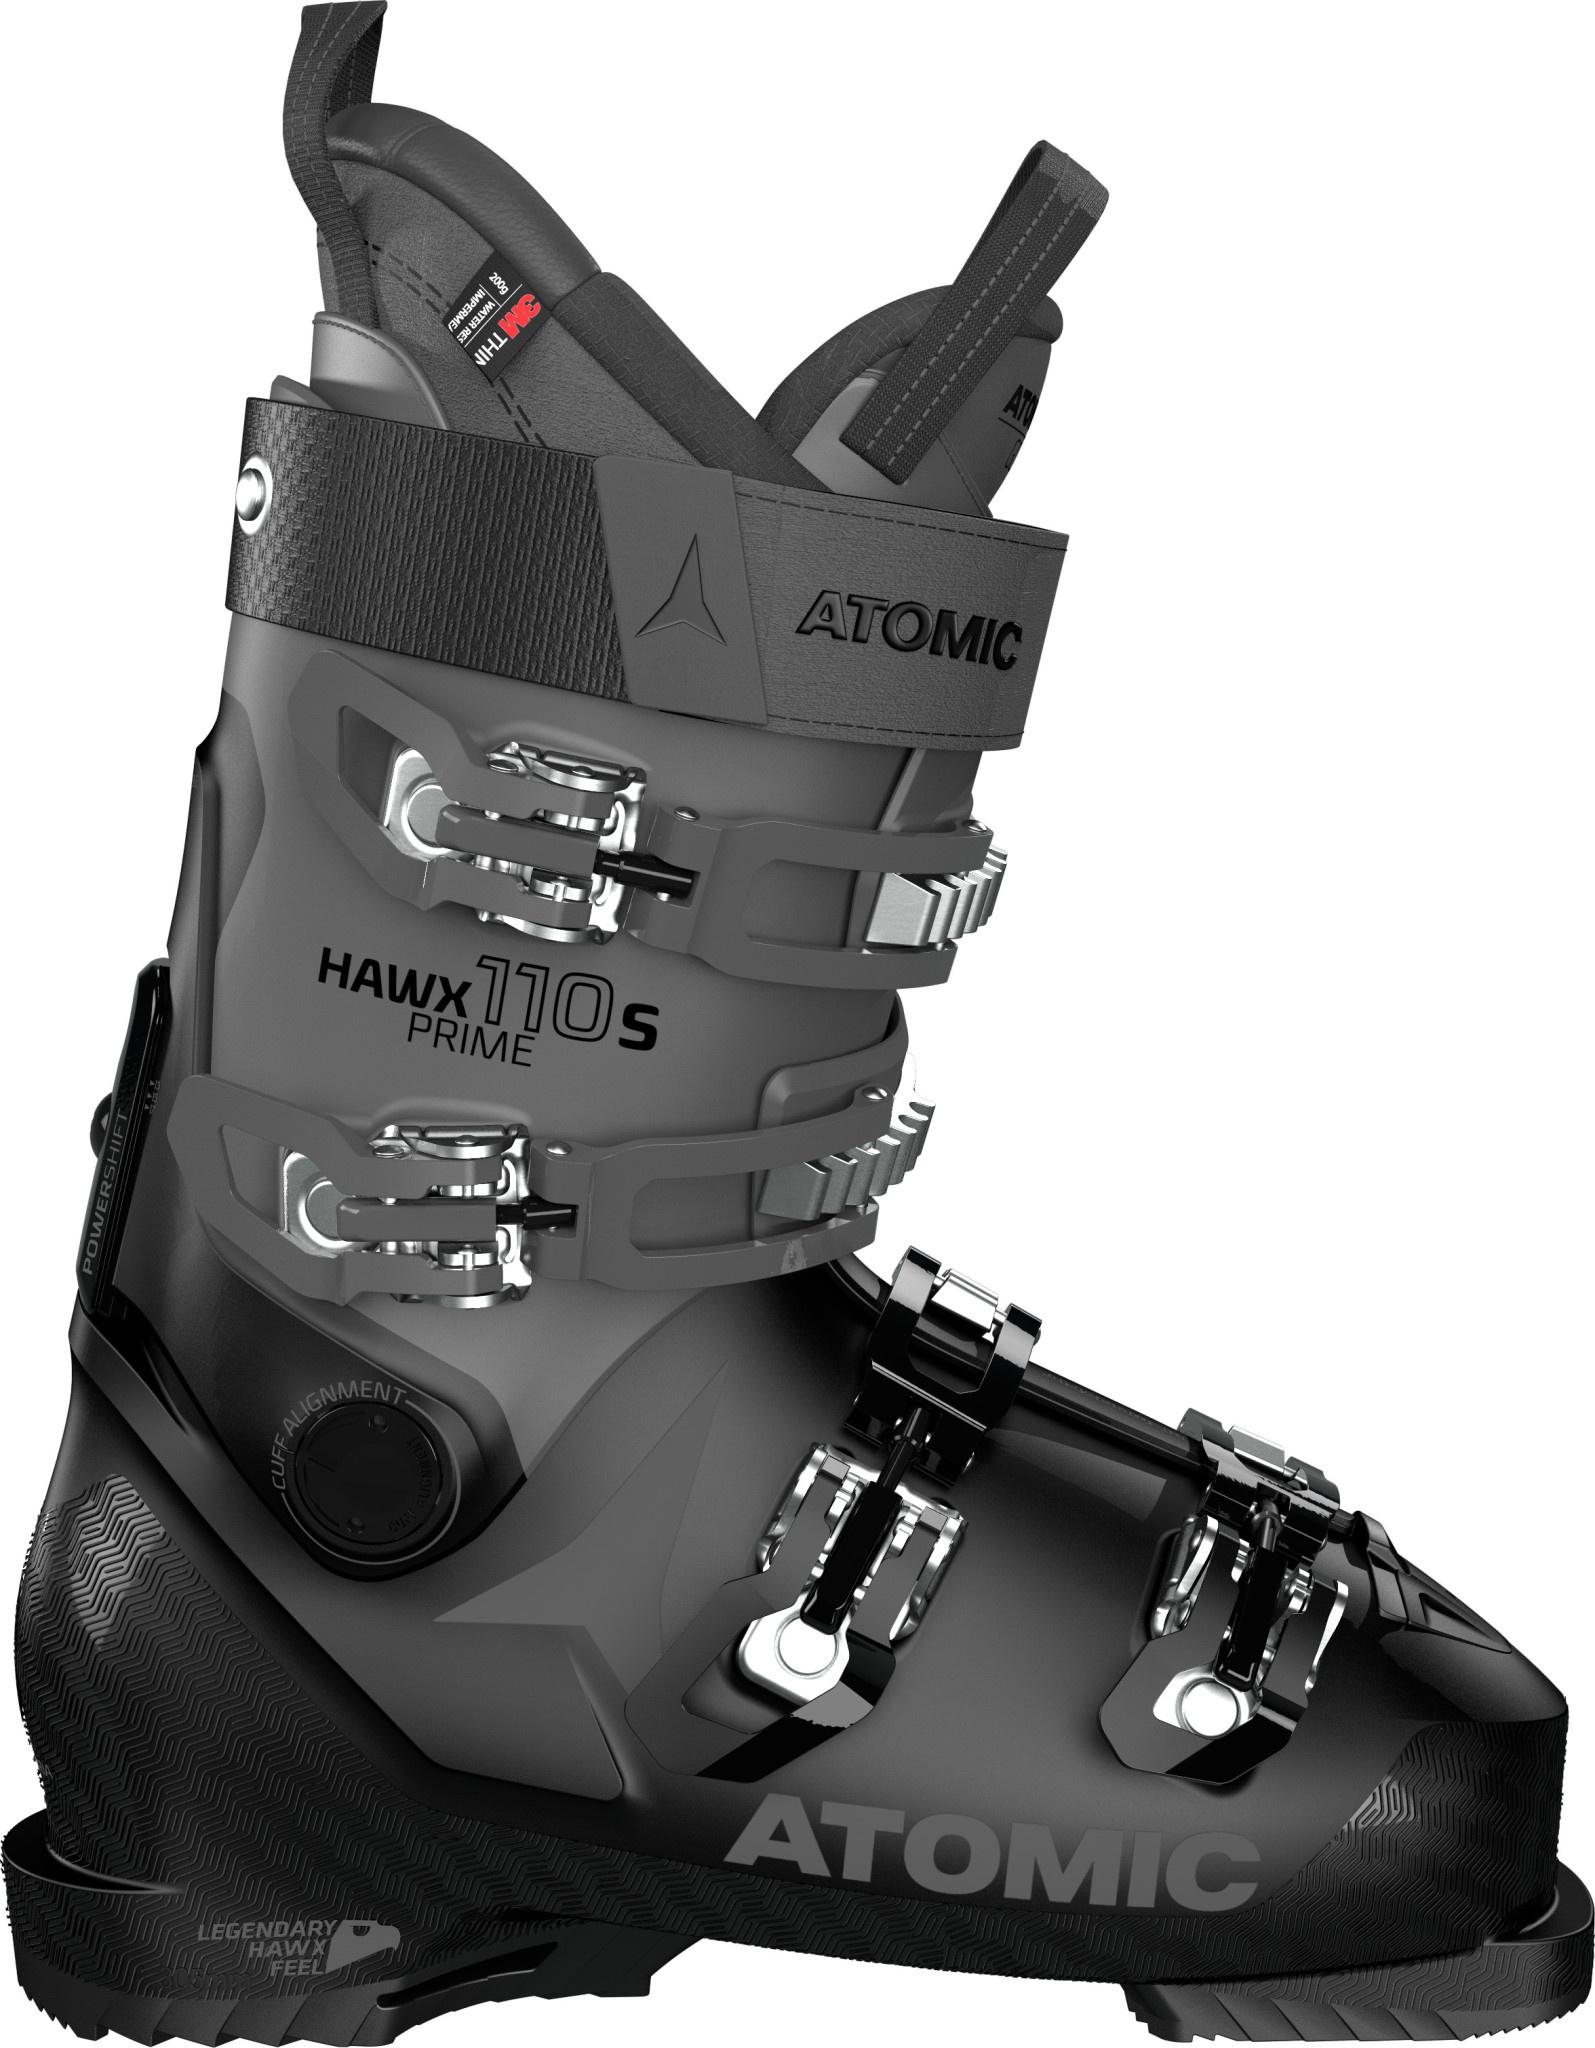 Atomic Hawx Prime 110 S-1